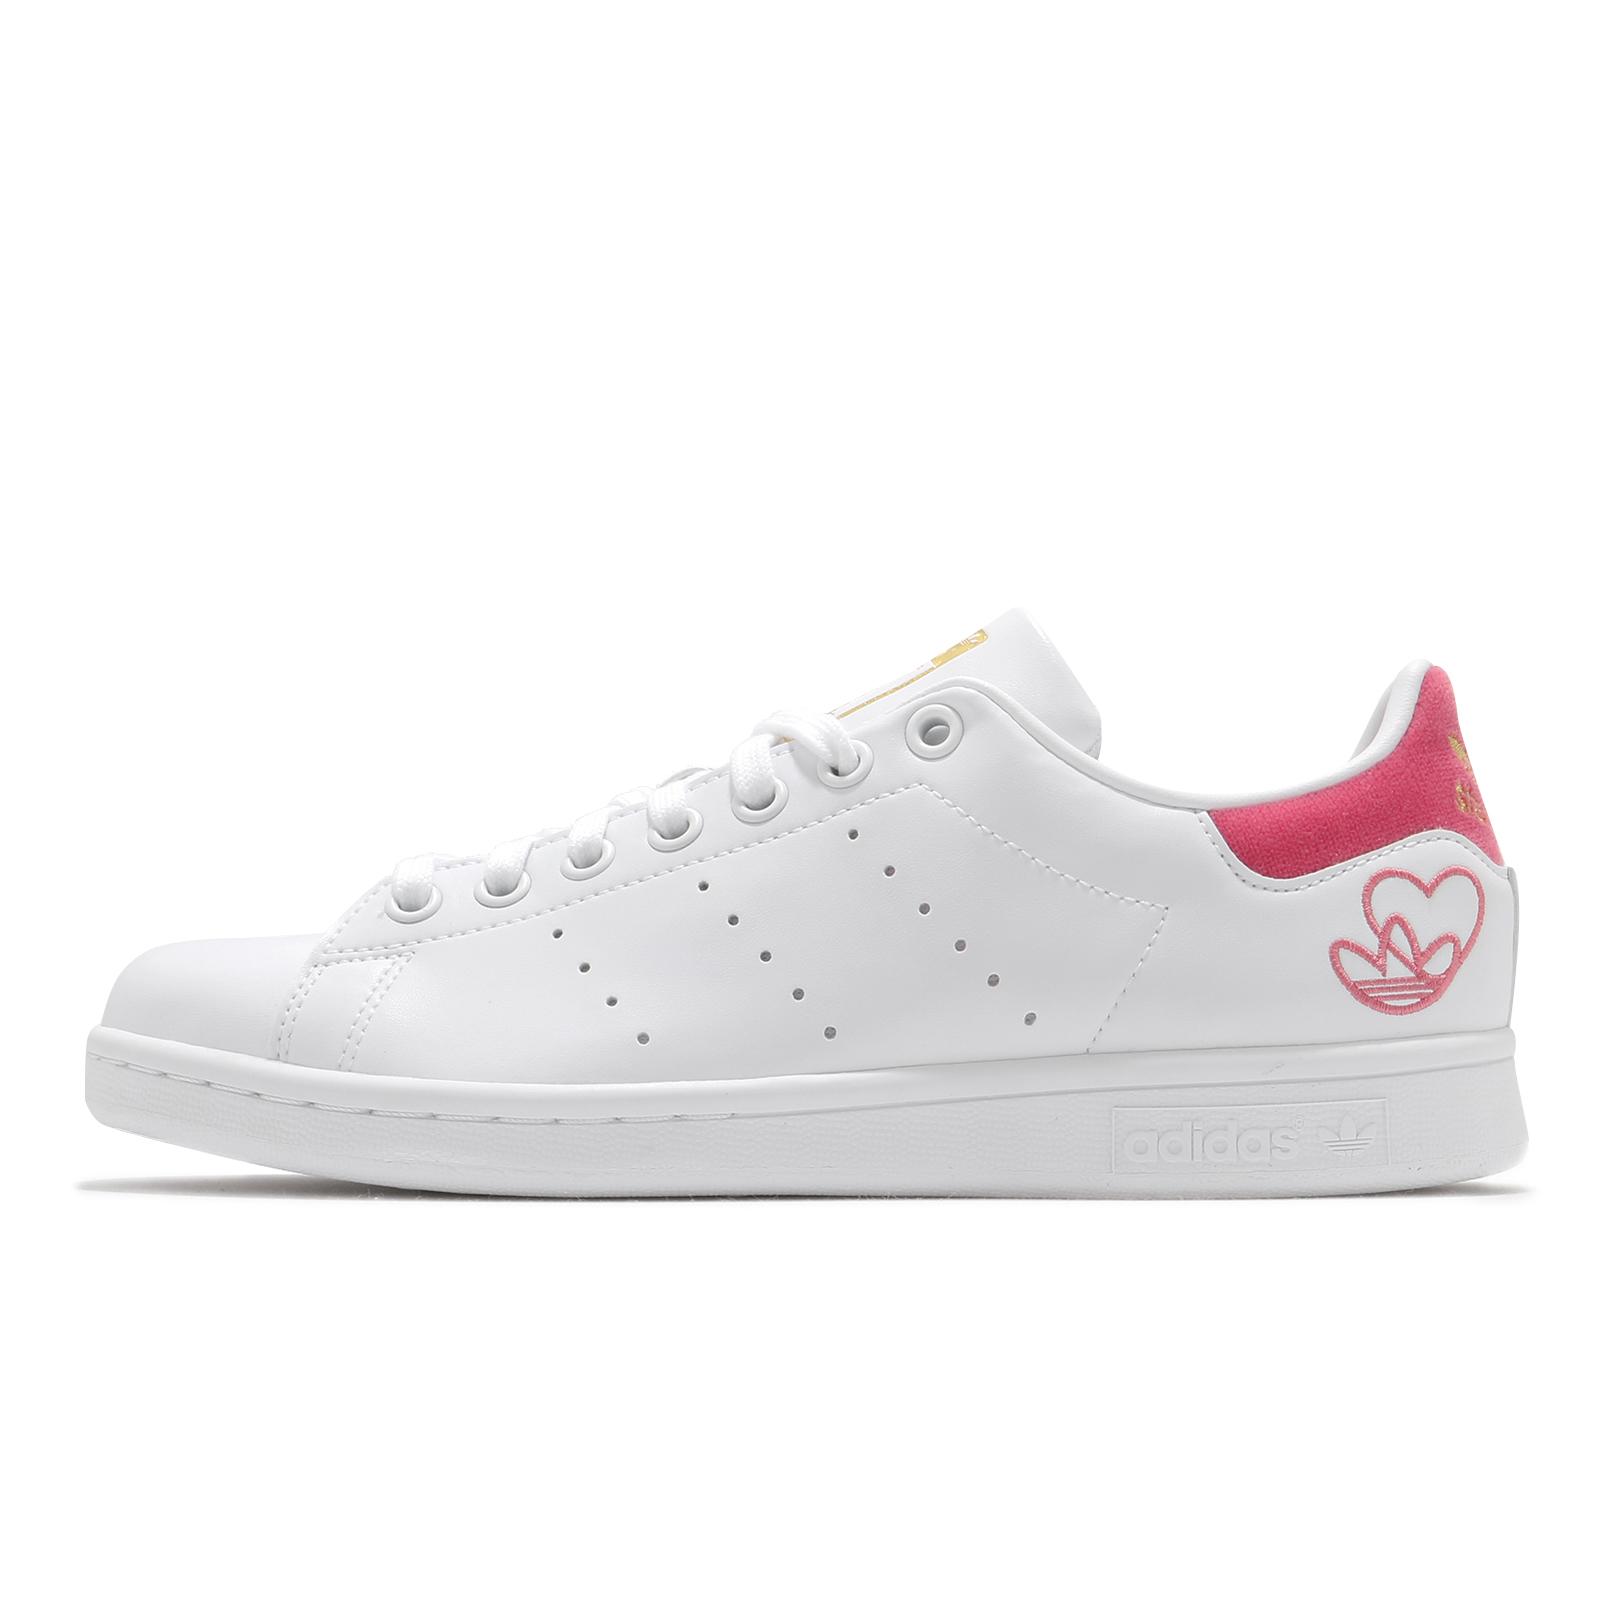 adidas 休閒鞋 Stan Smith W 白 桃紅 金標 三葉草 愛心 女鞋 小白鞋 【ACS】 G55666